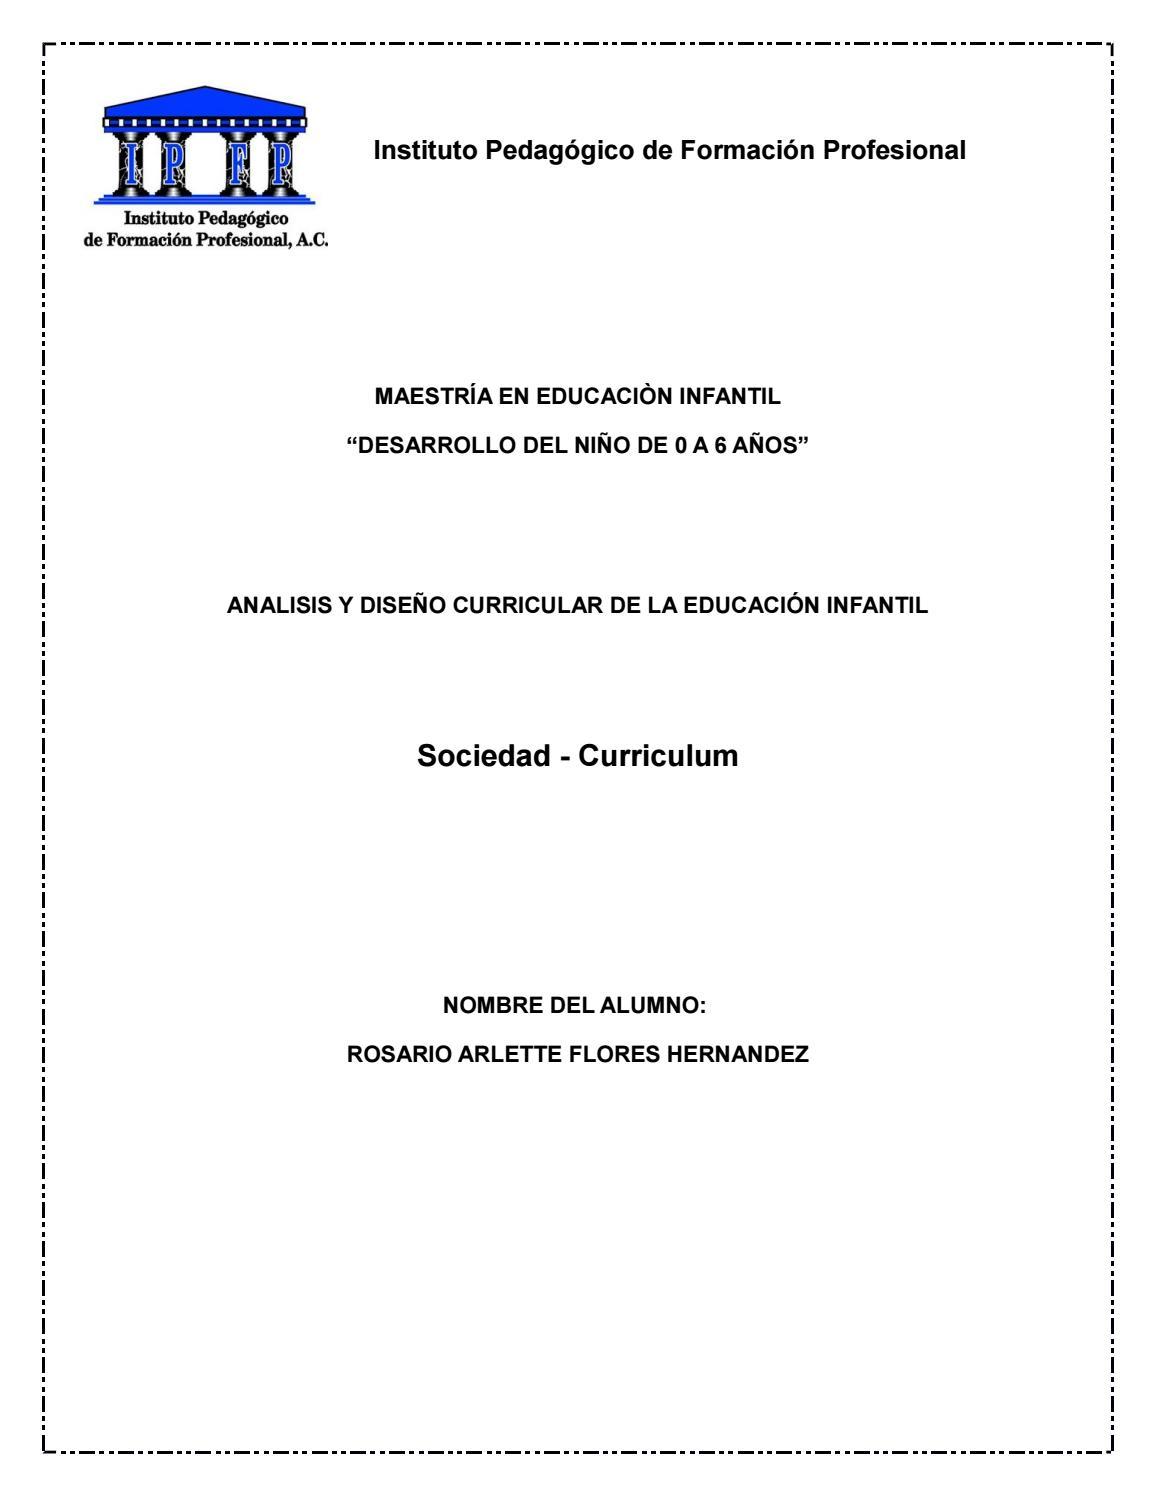 Sociedad - curriculum by arlettete7891 - issuu